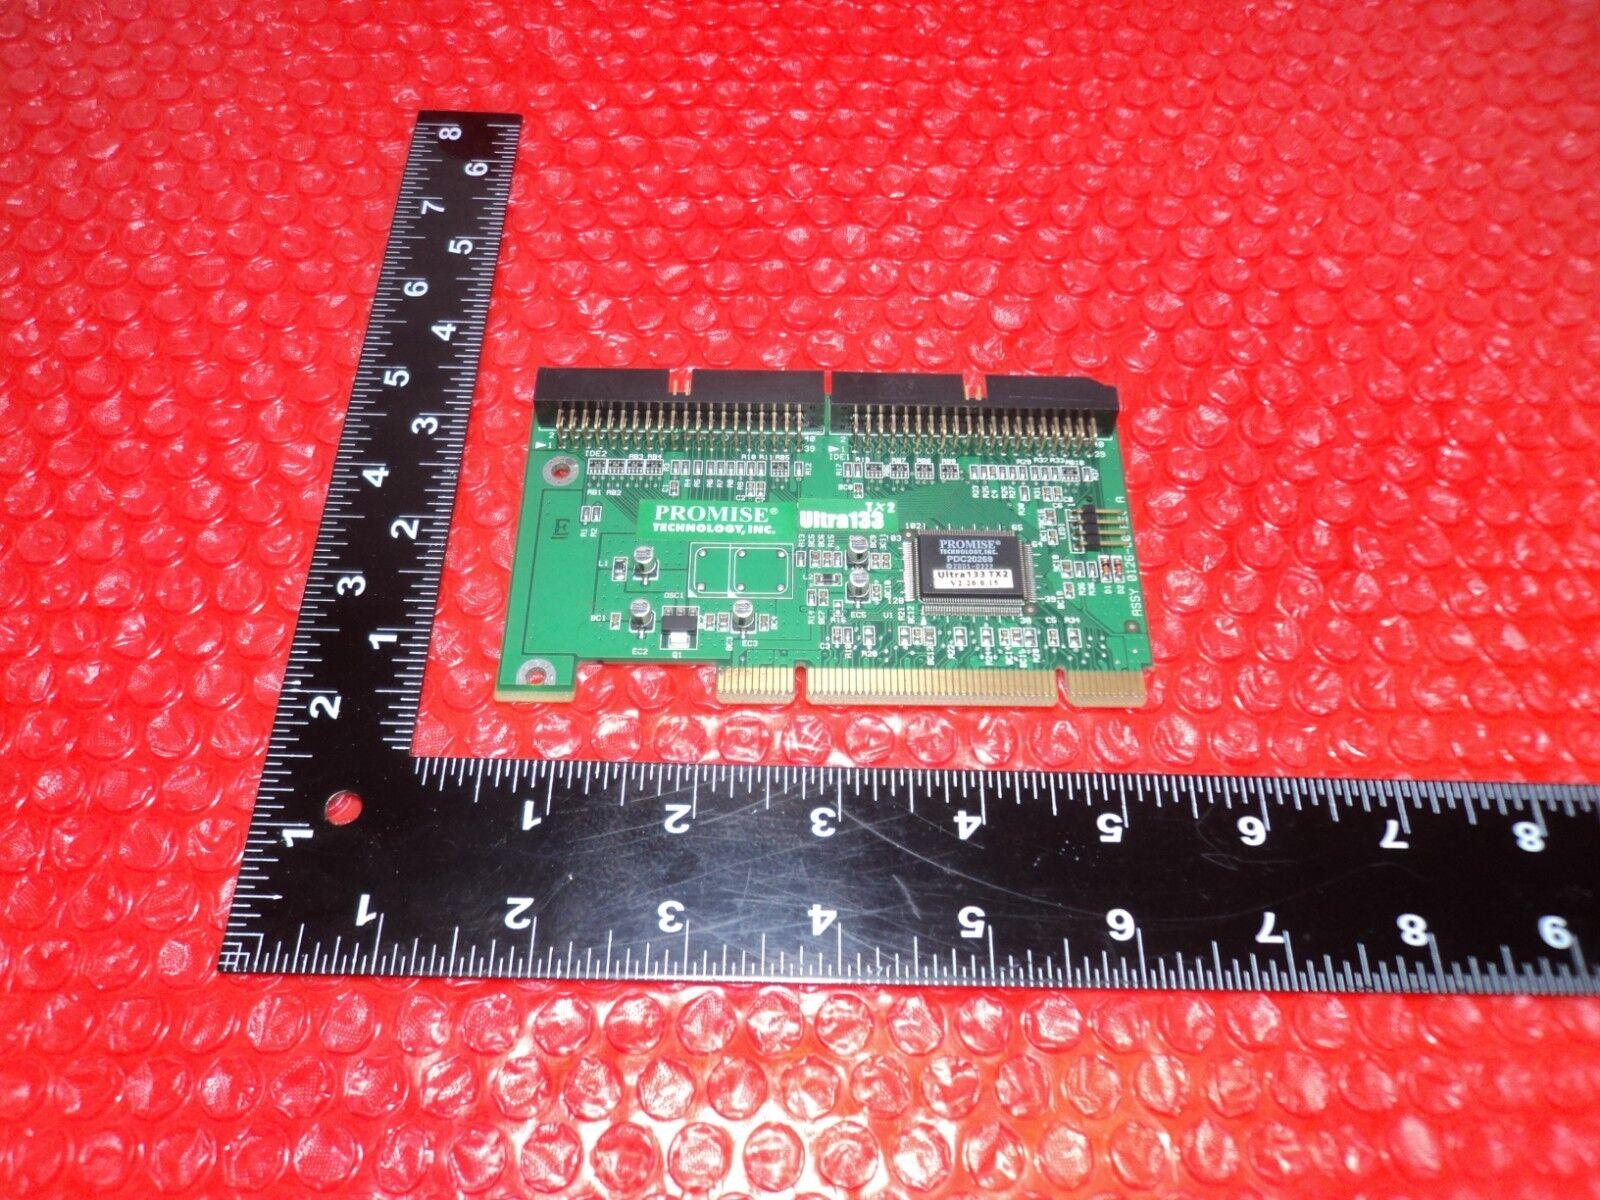 Promis Technology Ultra133 TX2 V2.20.0.15 Dual IDE PCI Card